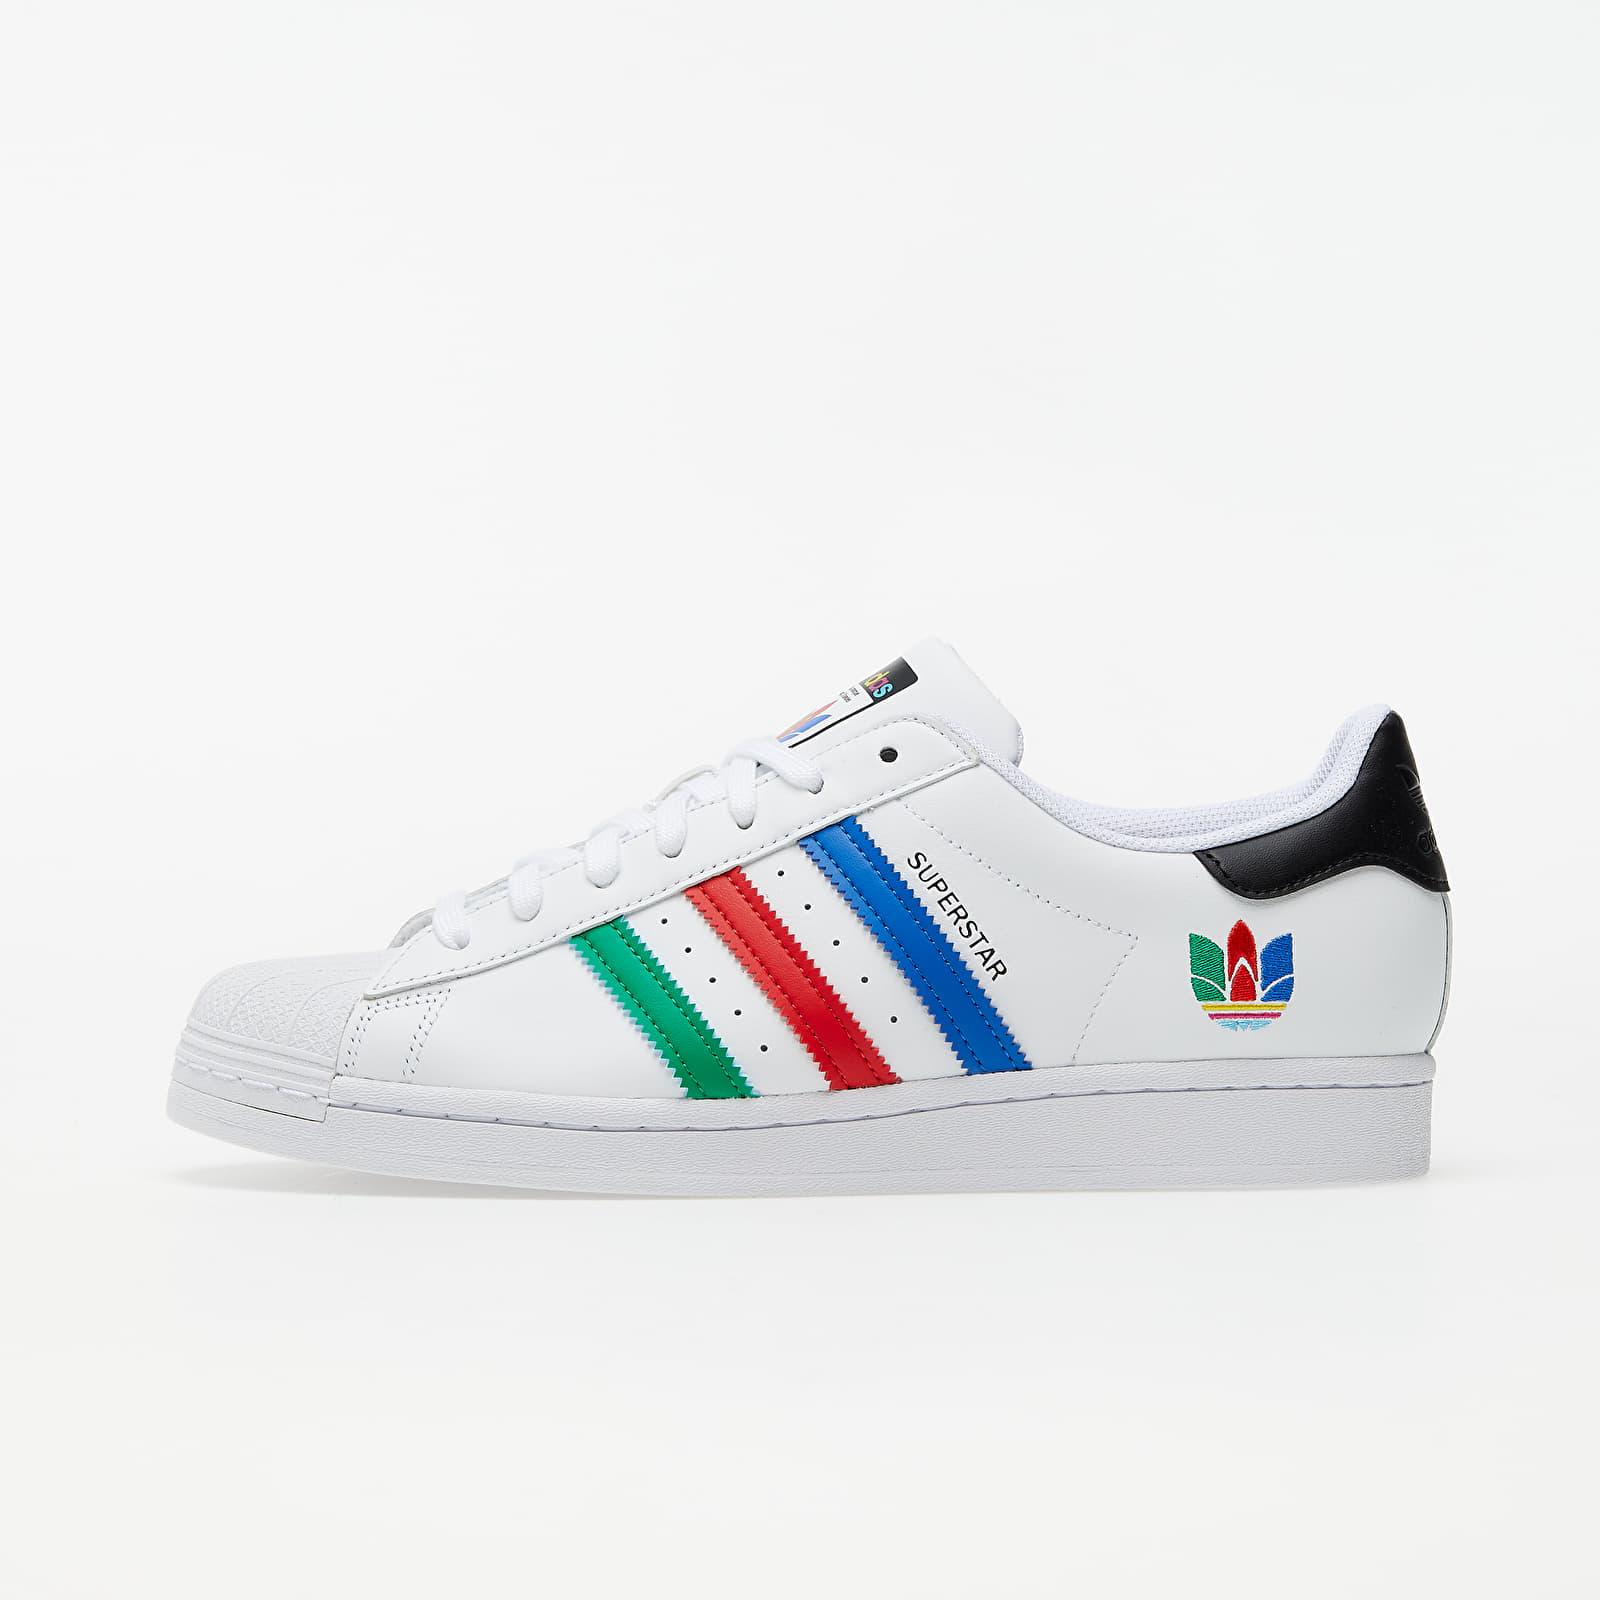 adidas Superstar Ftw White/ Green/ Core Black EUR 47 1/3